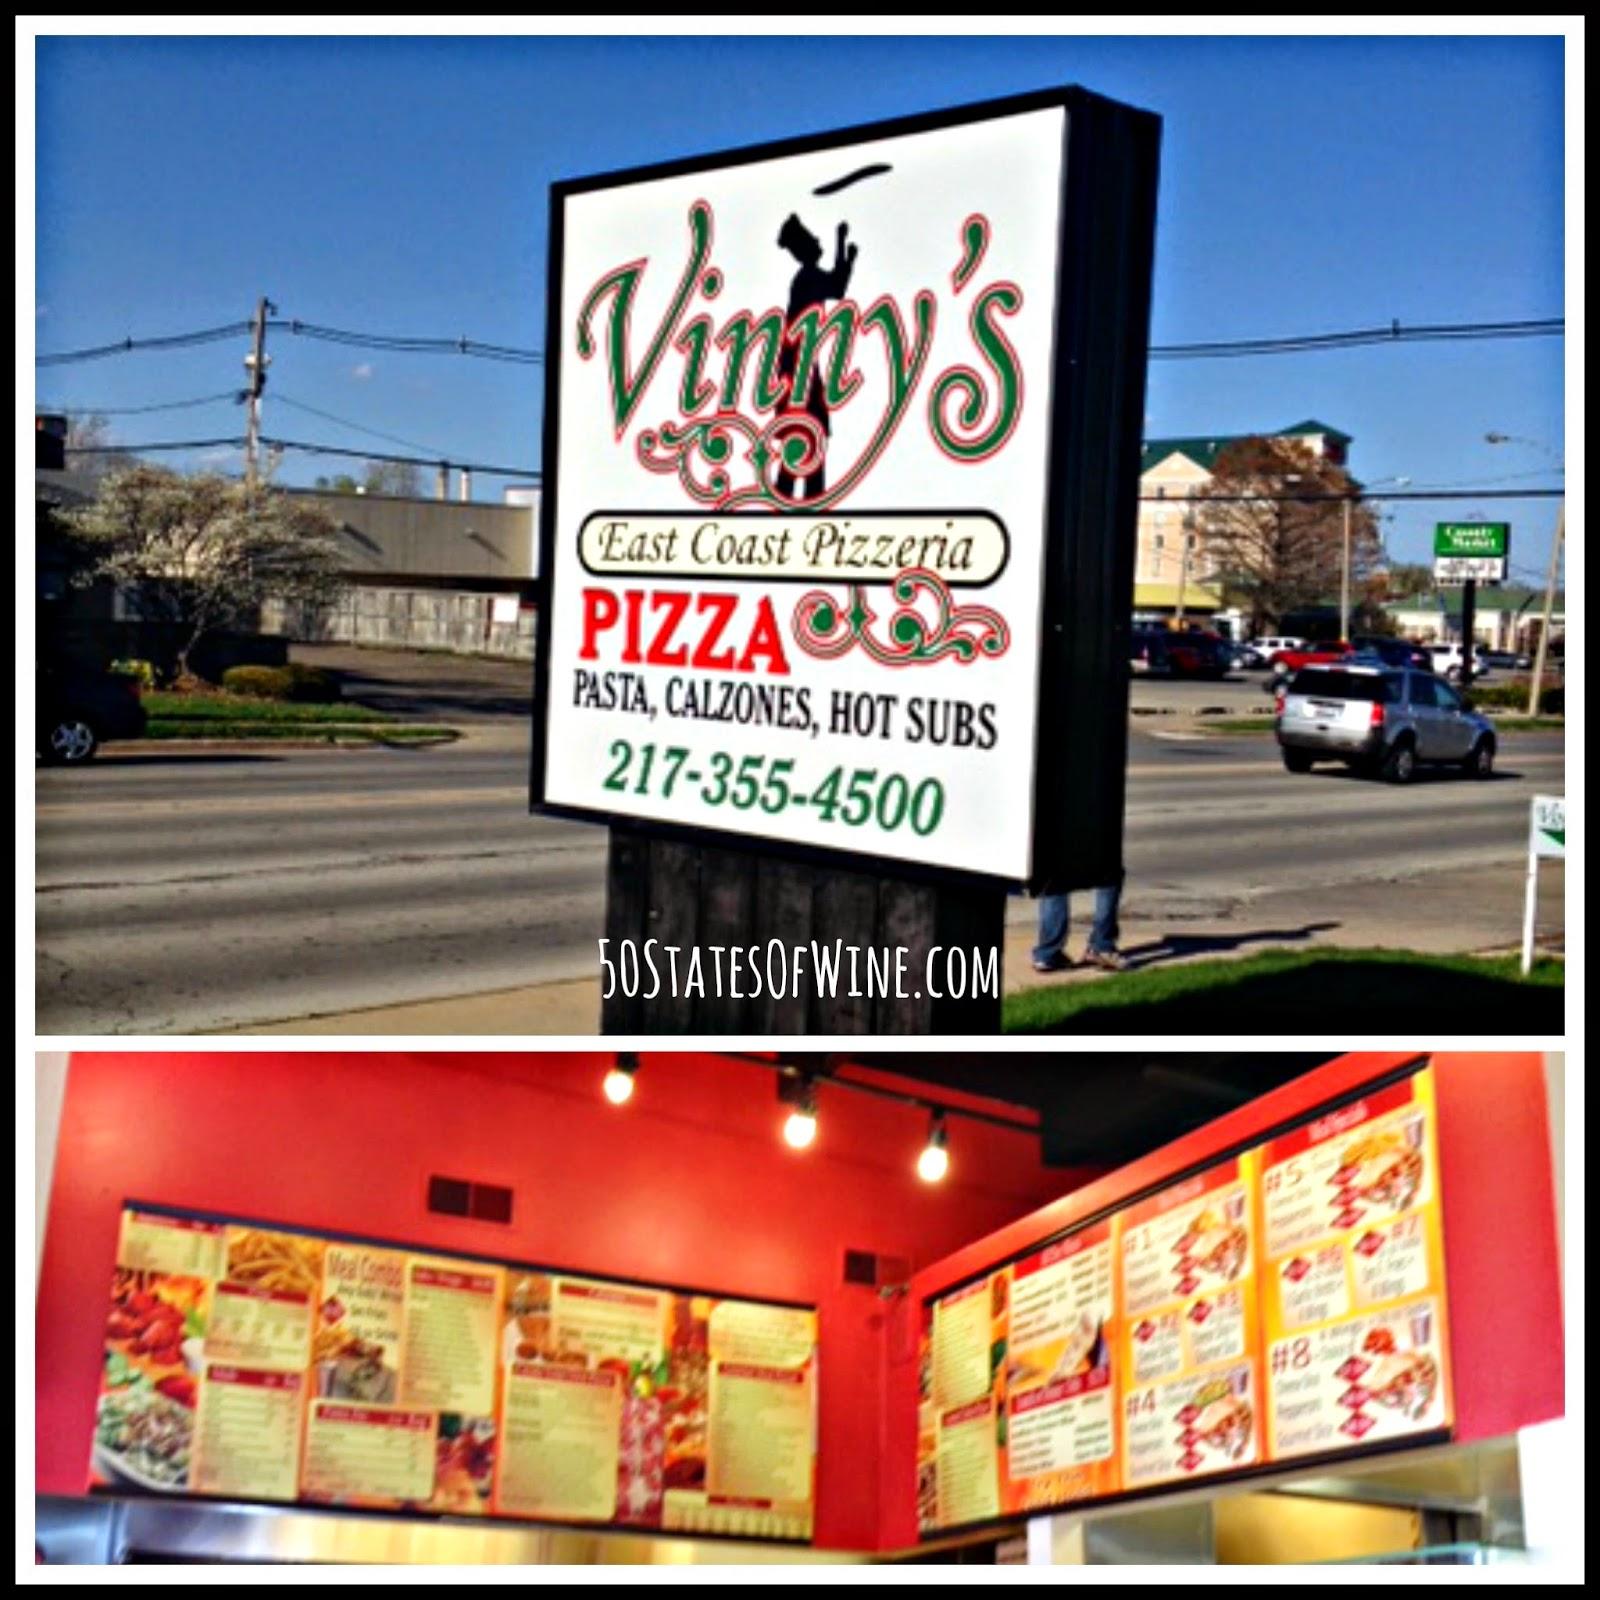 Vinny's East Coast Pizzeria